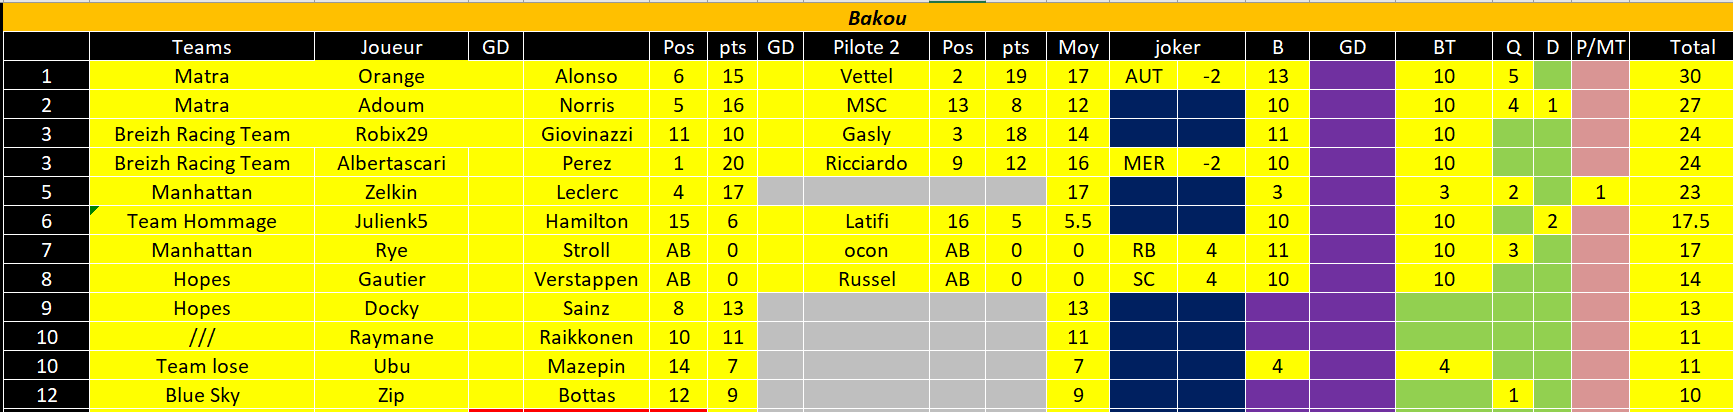 [FMWC] Topic du championnat 2021 - Page 21 Bakou10